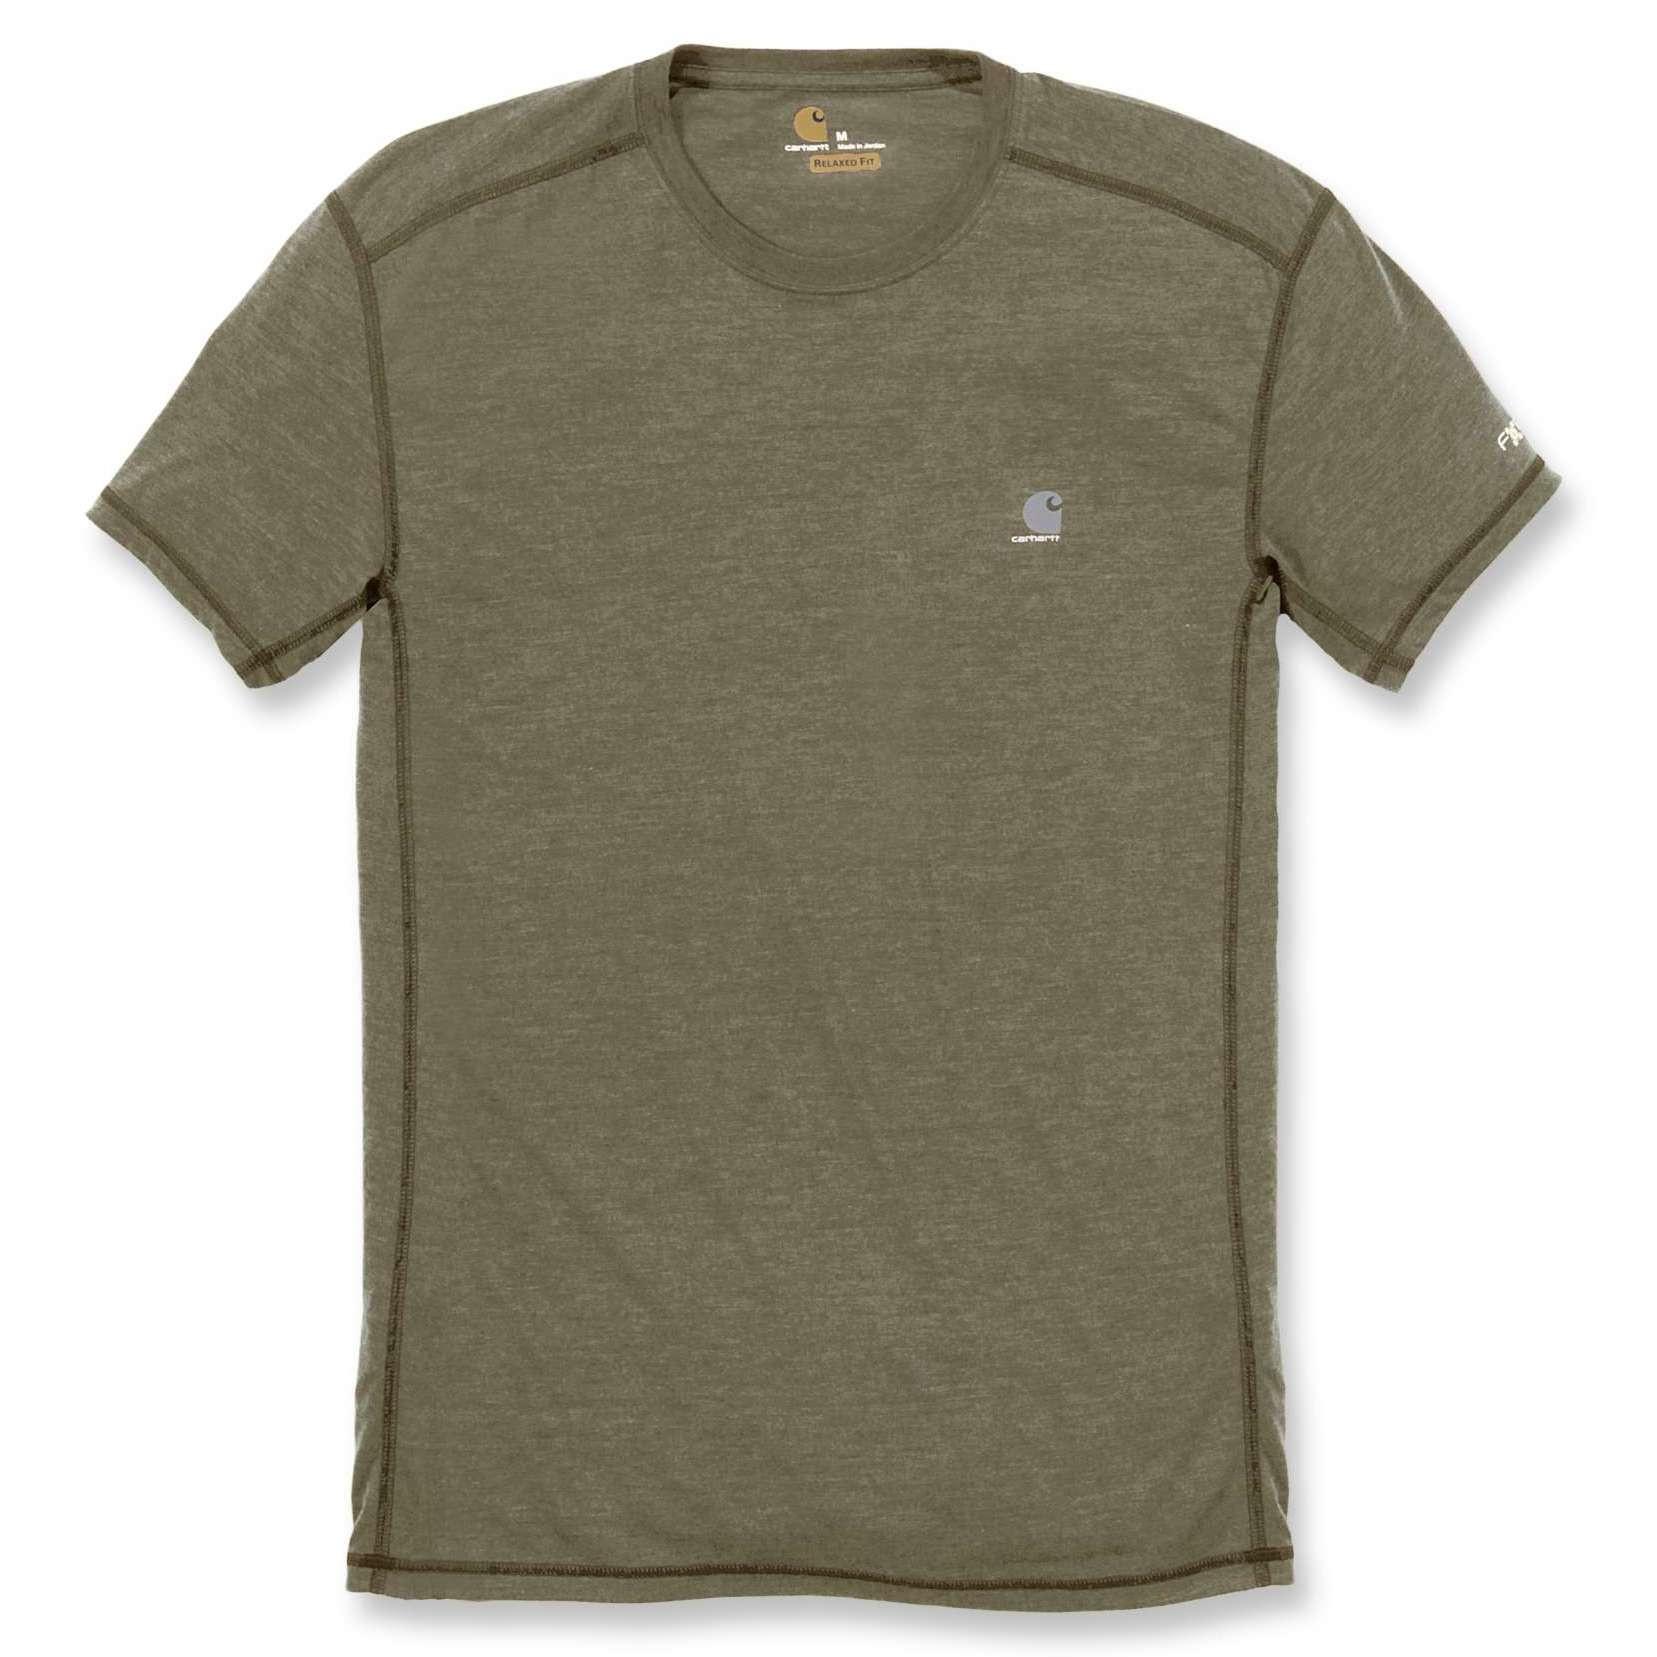 Футболка Carhartt Force Extremes T-Shirt S/S 102960 (Burnt Olive Heather)